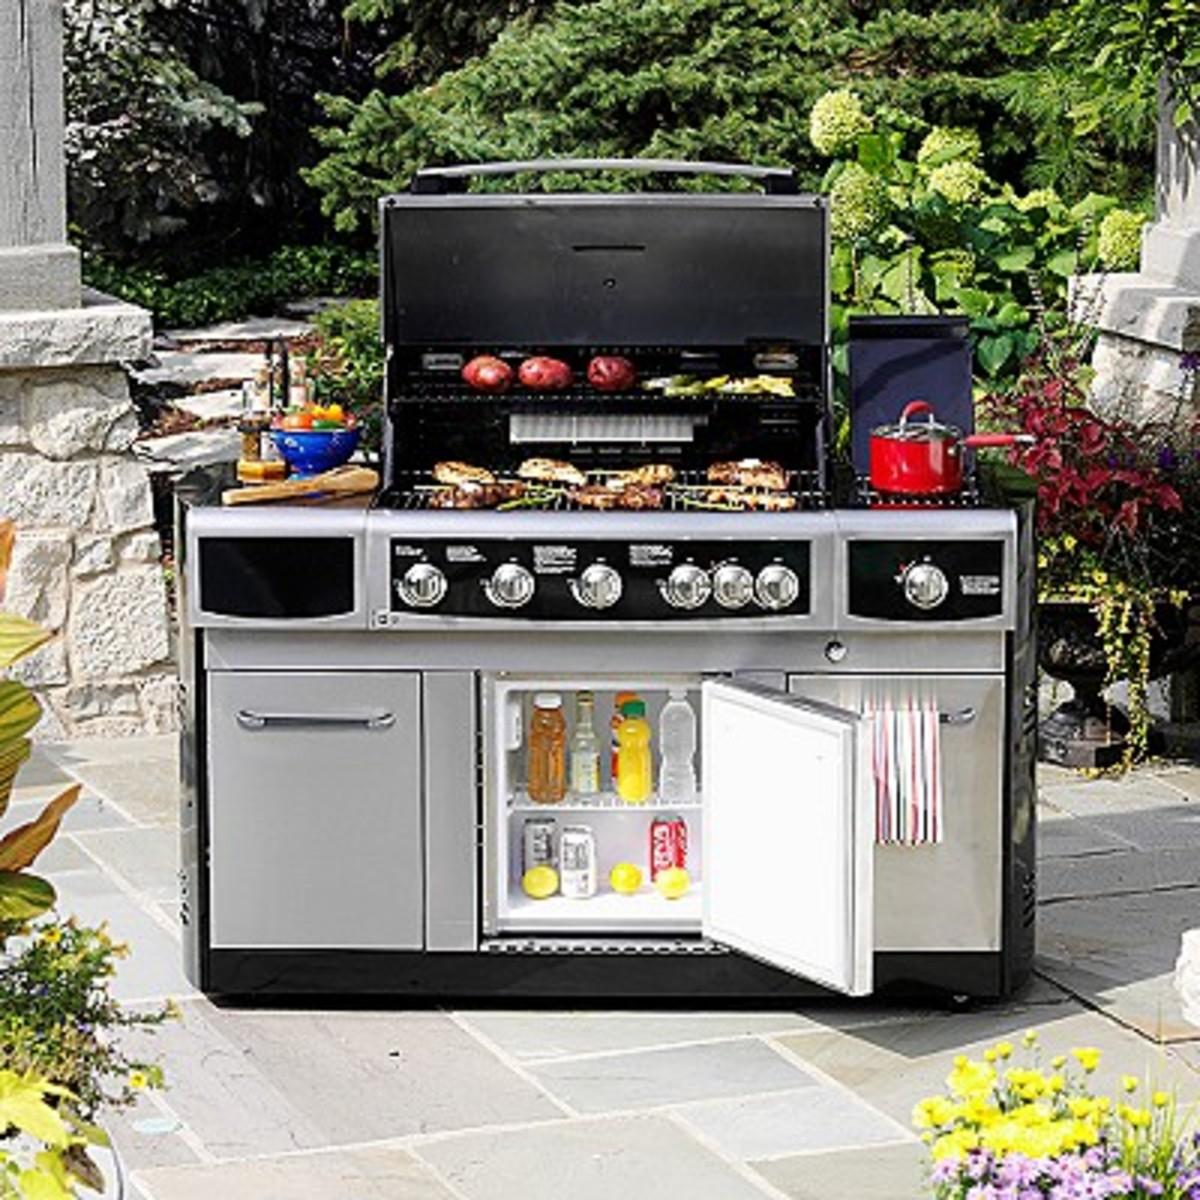 Kenmore grill island model. 810-0010